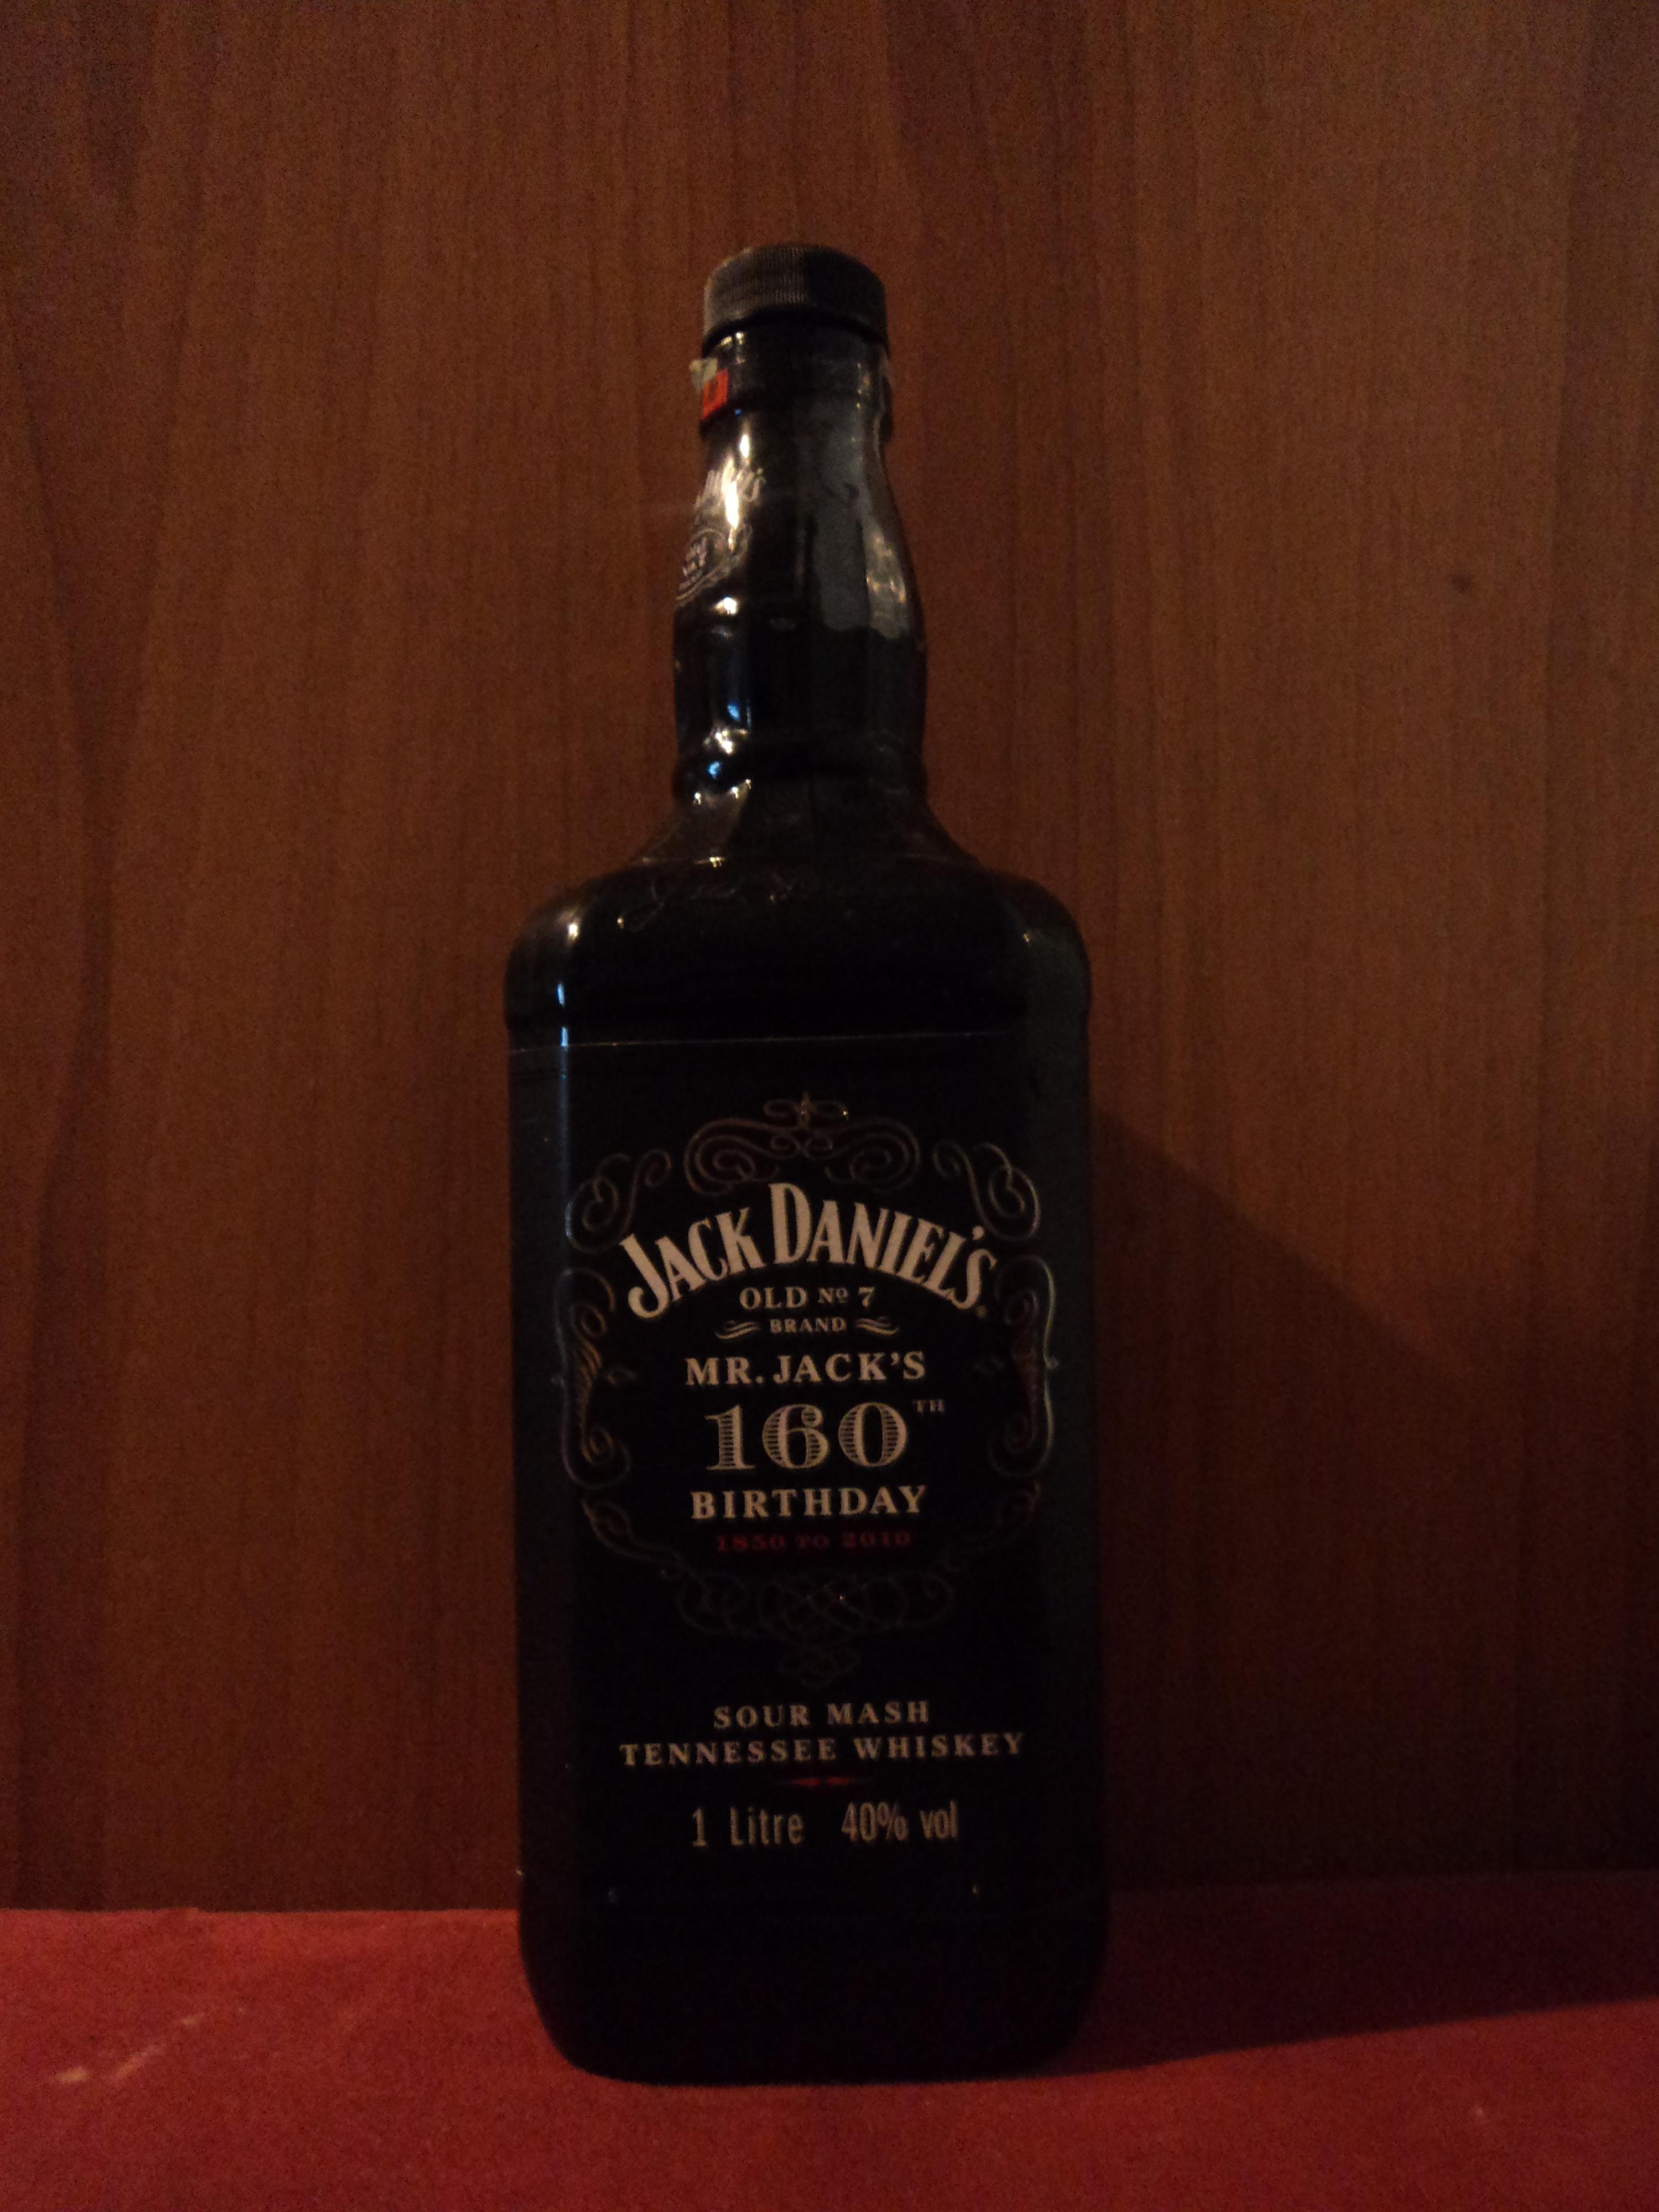 FileJack Daniels Whiskey 99JPG